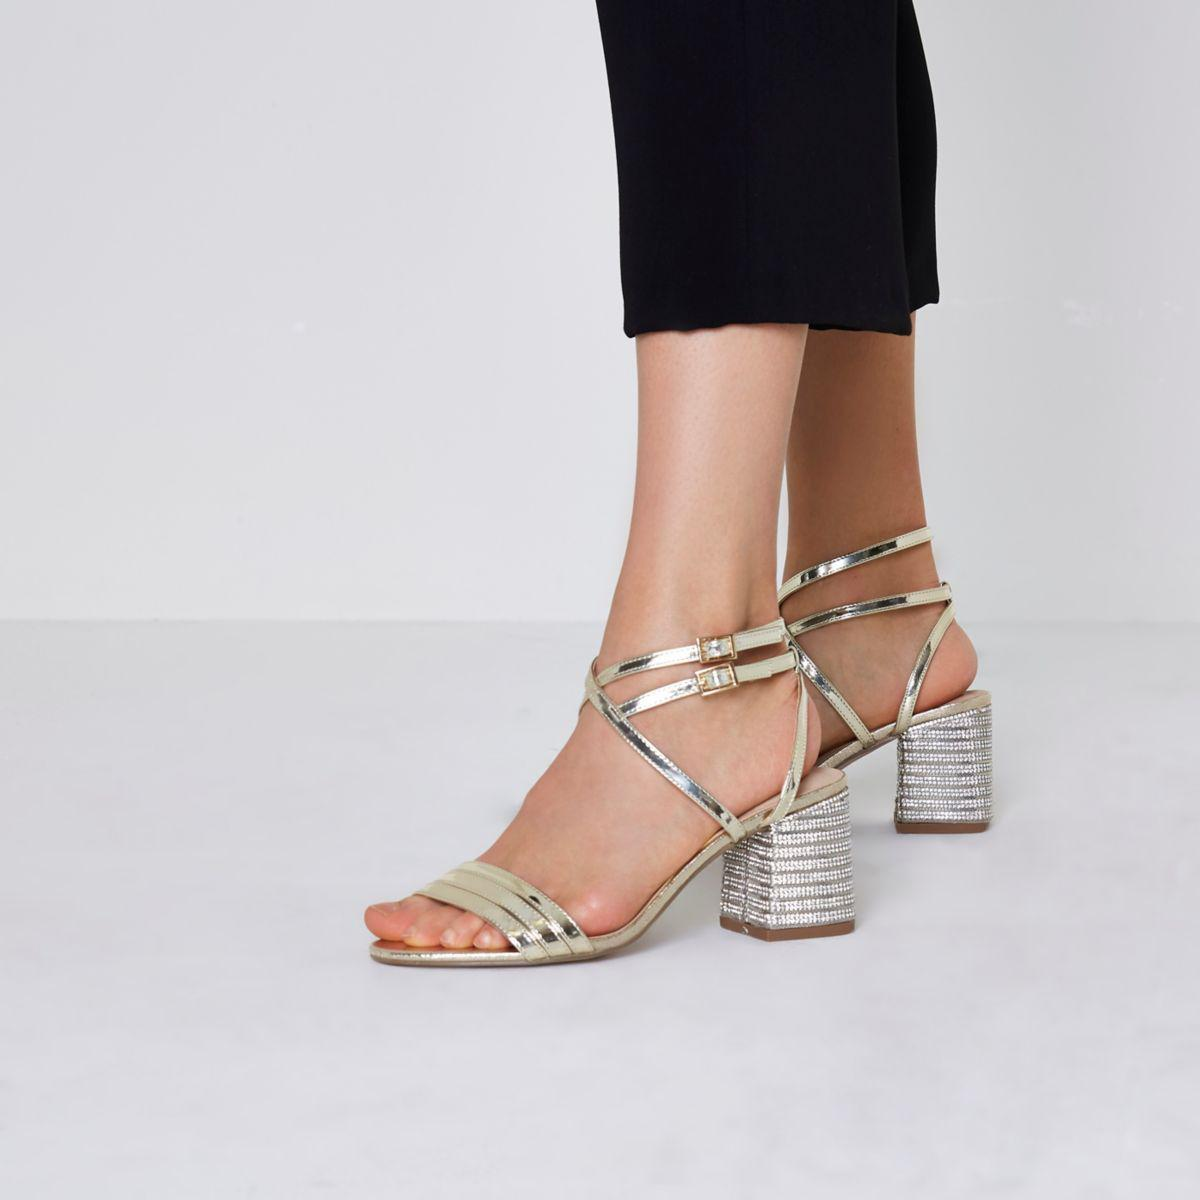 b8a06688d583 River Island Gold Wide Fit Metallic Diamante Heel Sandals Gold Wide ...